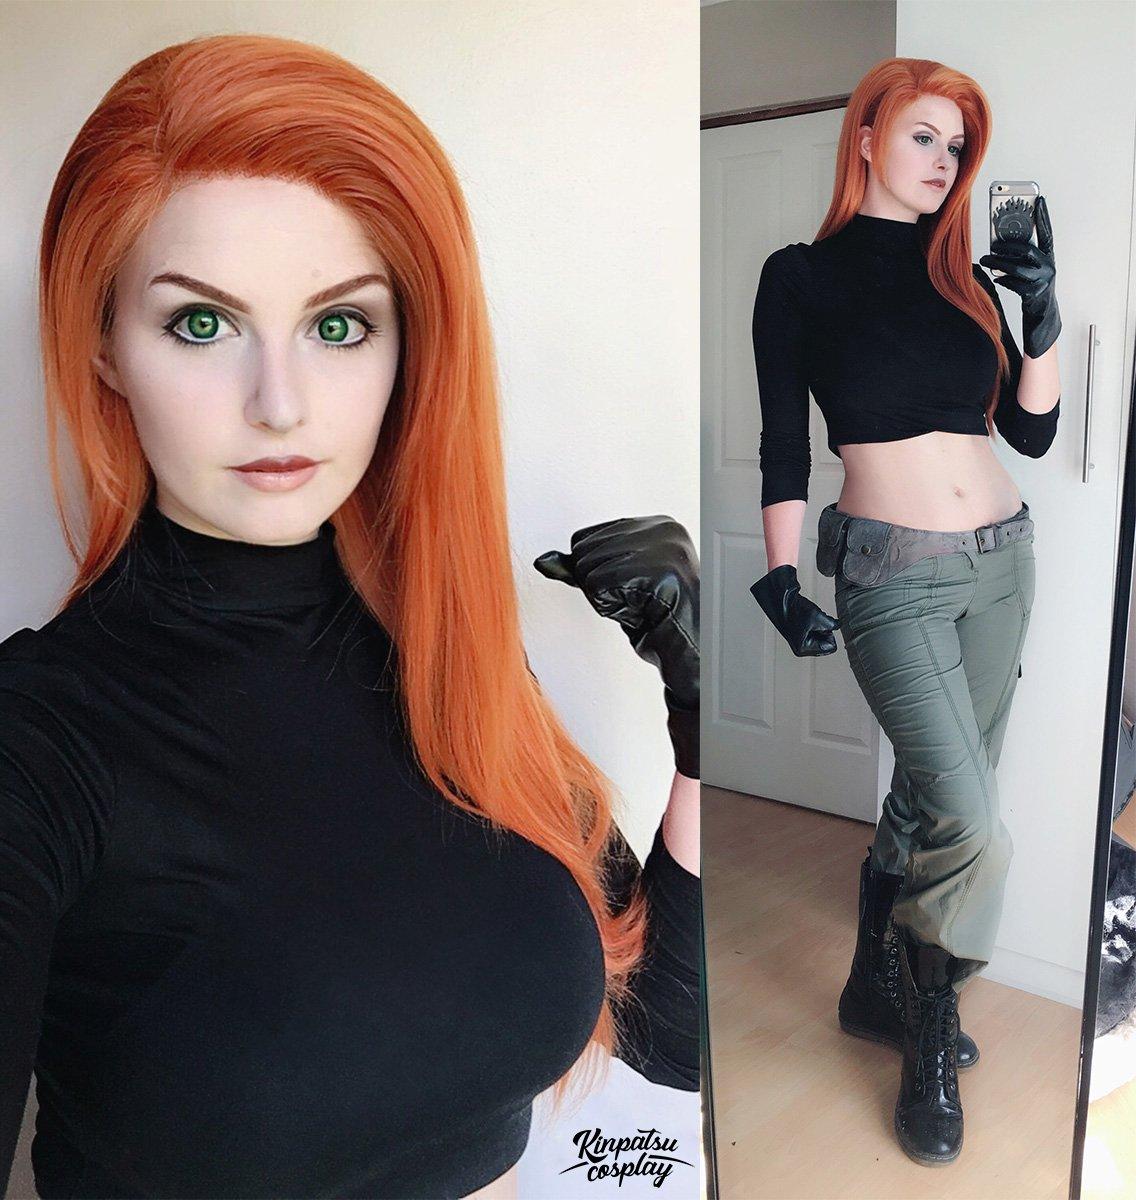 Kim Possible cosplay by Kinpatsu